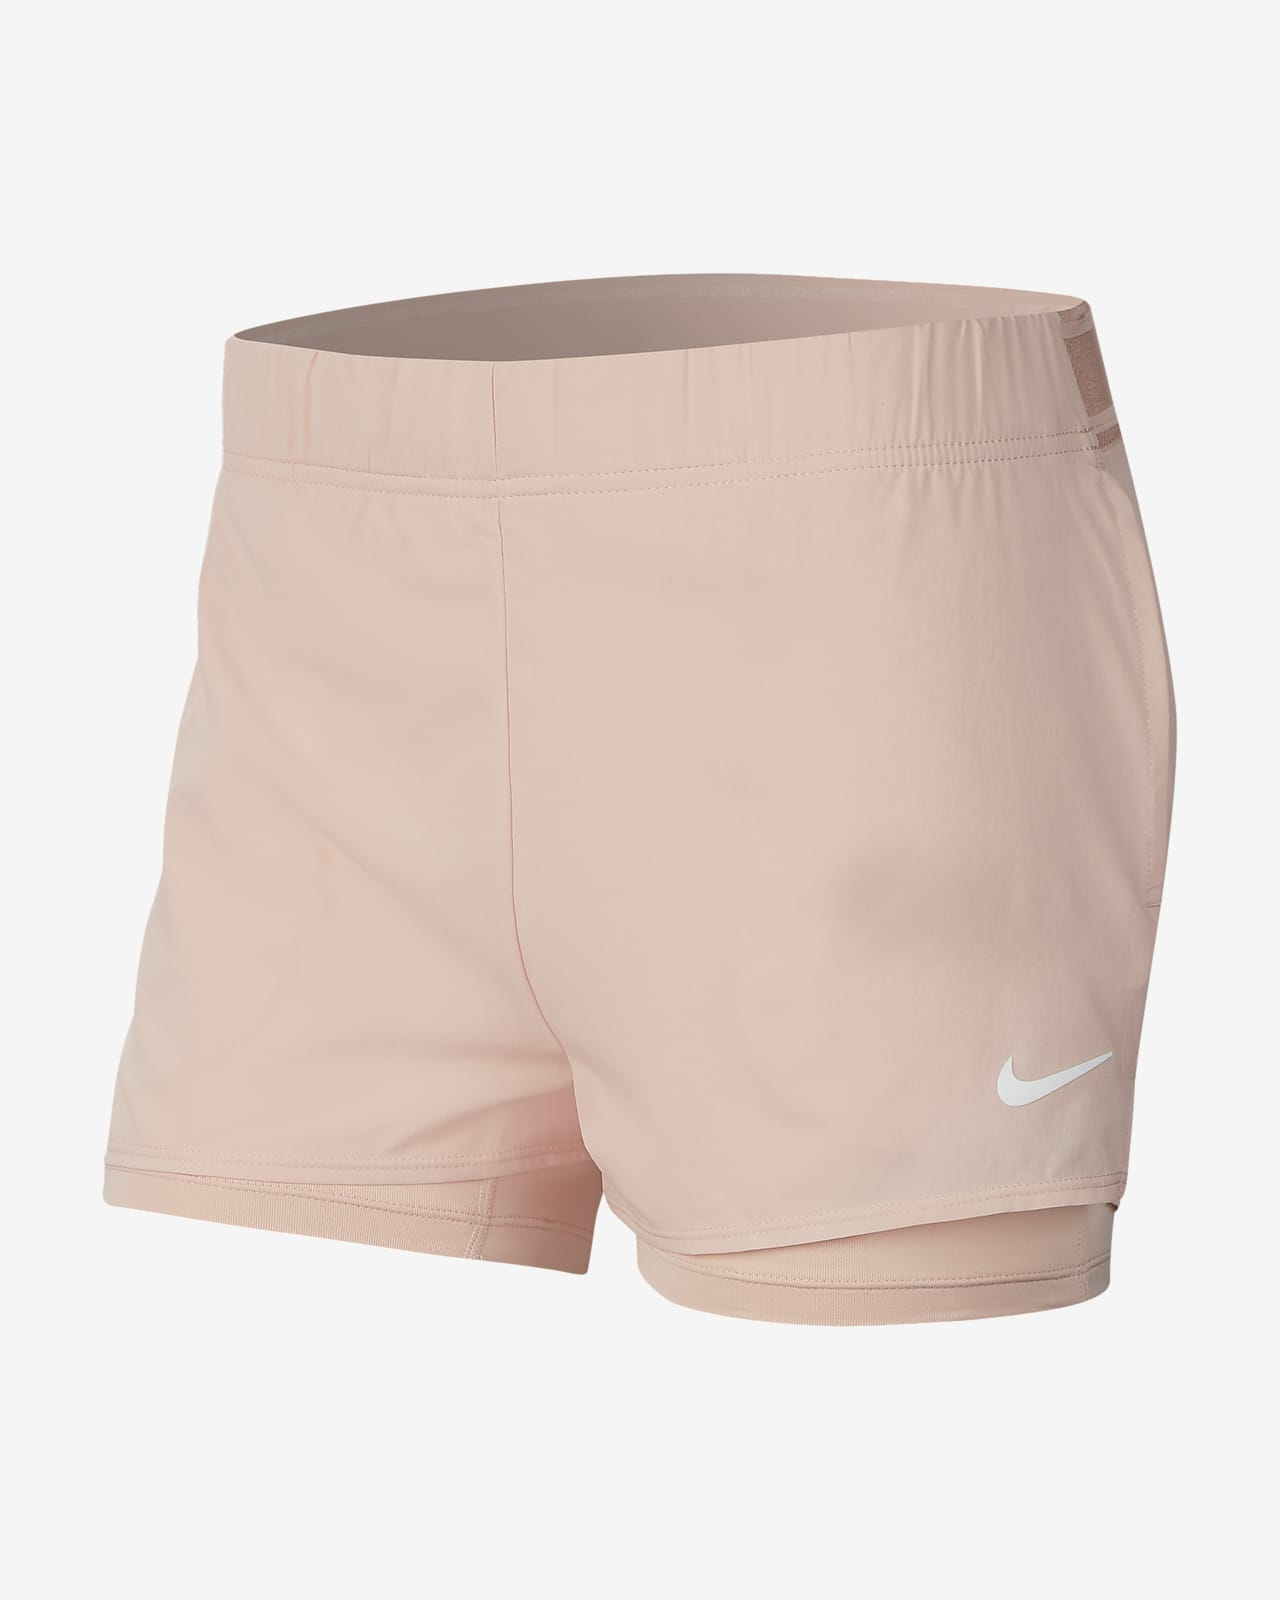 Dámské tenisové kraťasy NikeCourt Flex